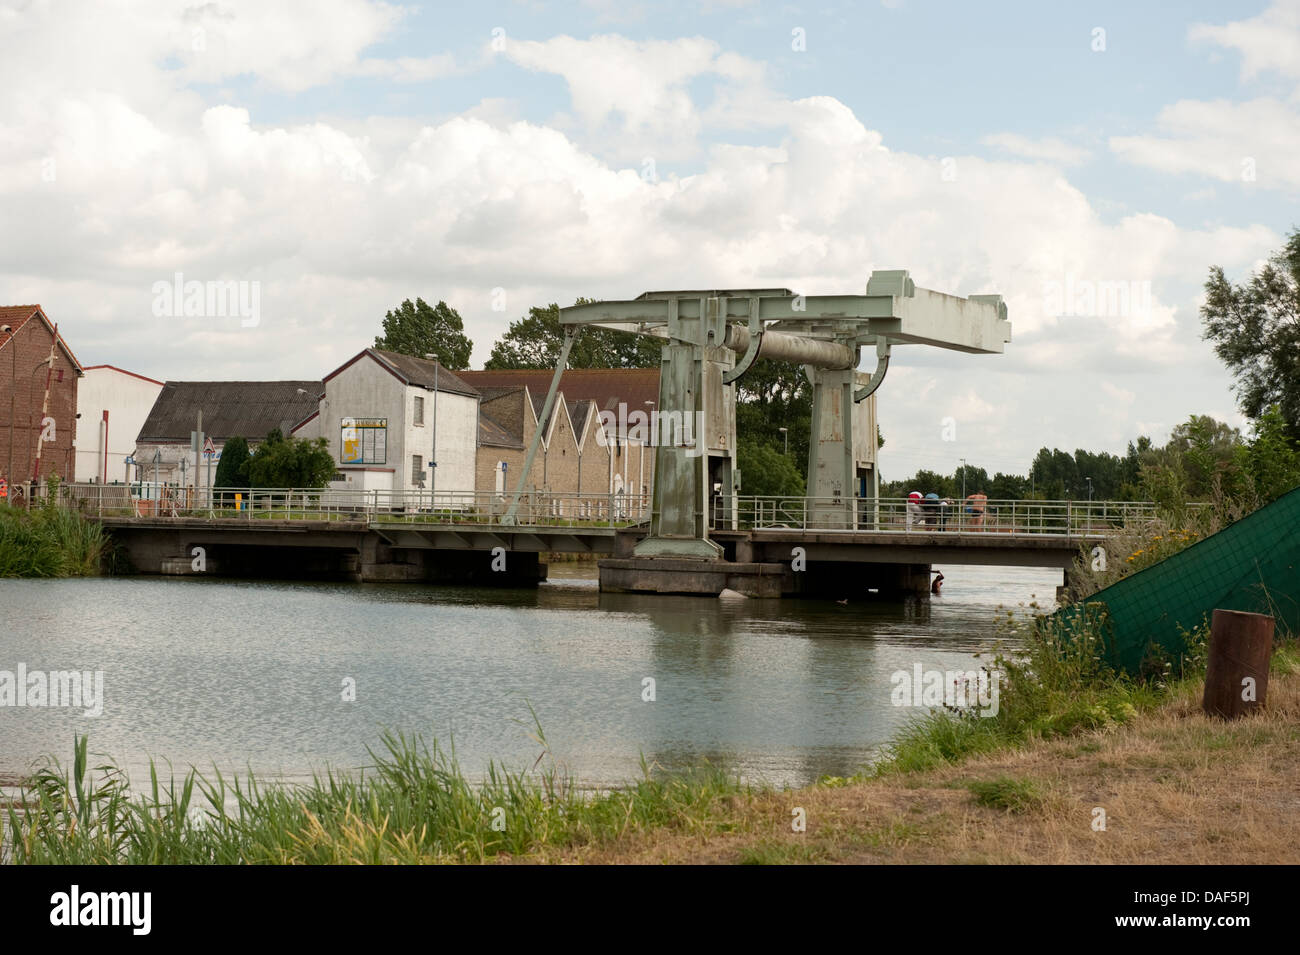 Cantilever Counterbalance Bridge Gravelines France - Stock Image